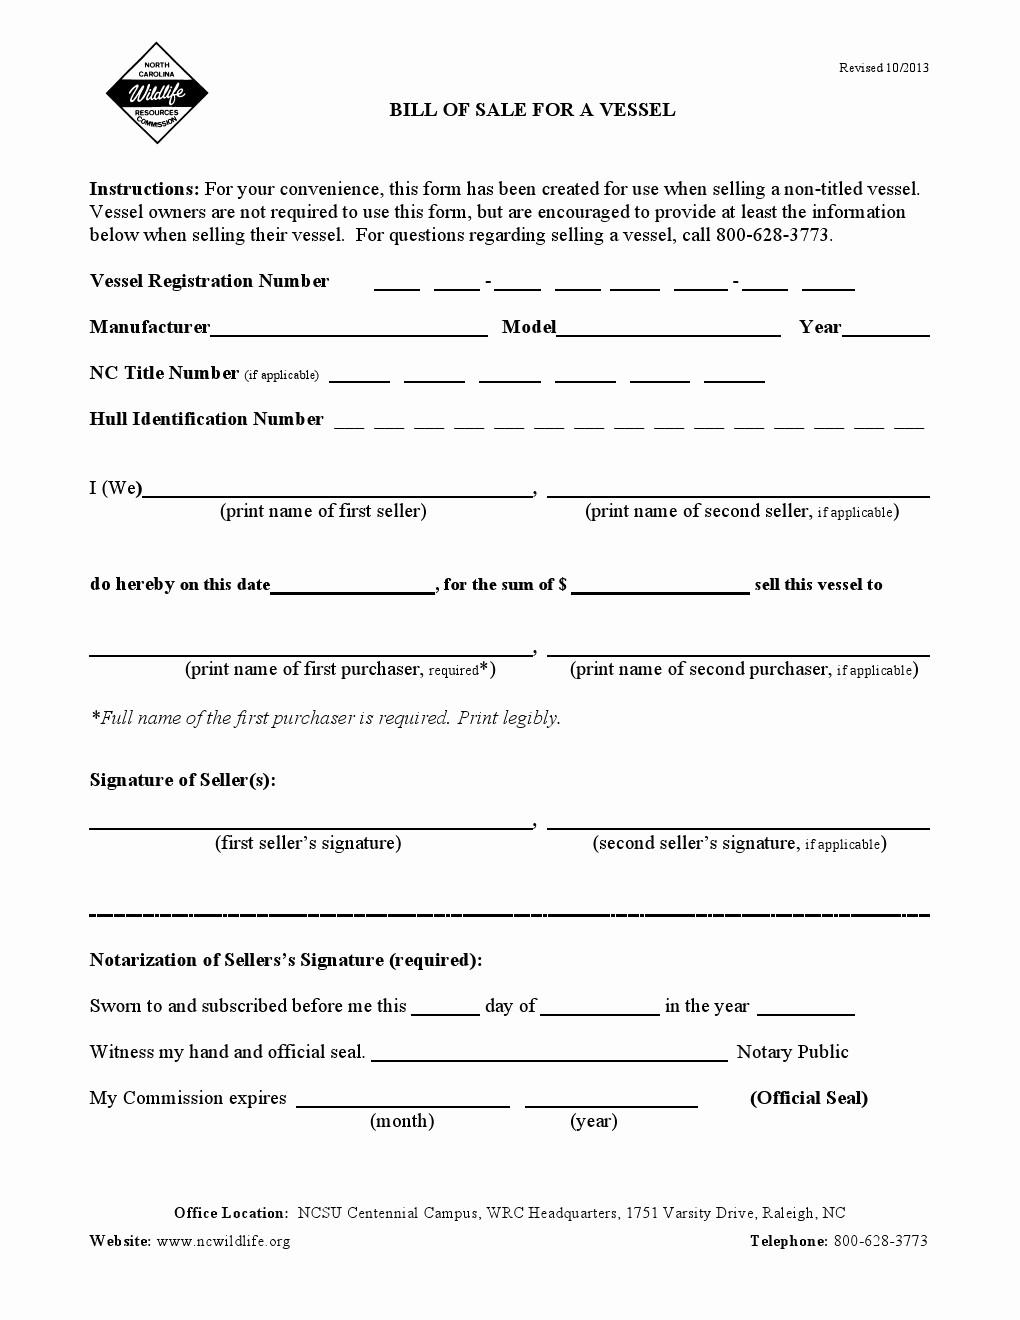 Bill Of Sale Printable Free Elegant Free north Carolina Vessel Bill Of Sale form Download